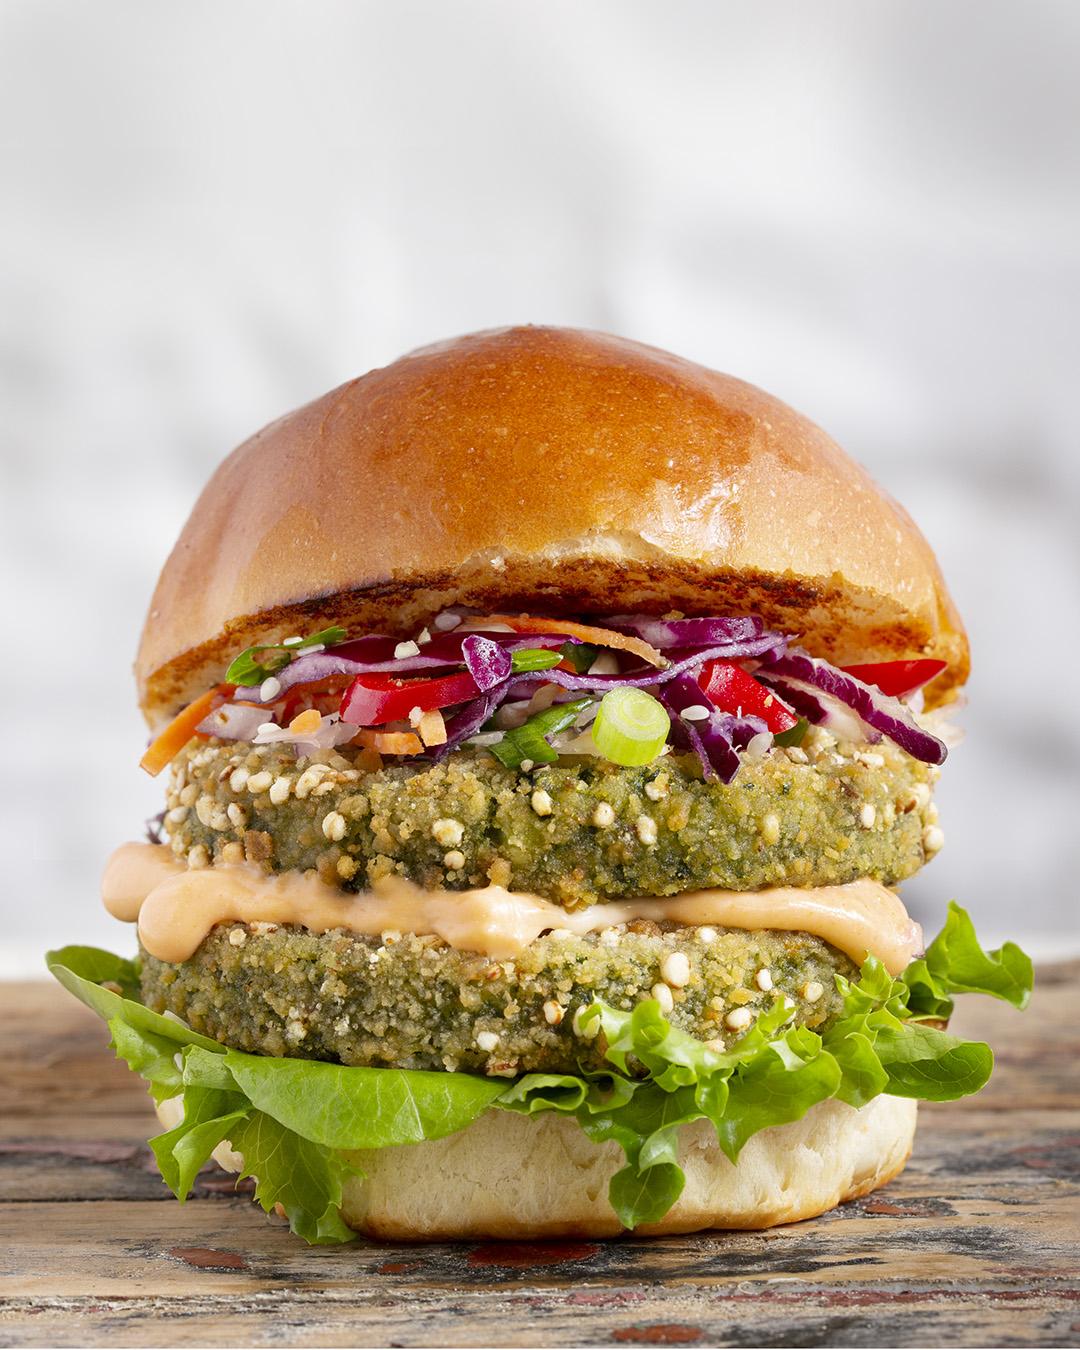 Alternative Vegan: International Vegan Fare Straight from the Produce Aisle (2nd Edition)